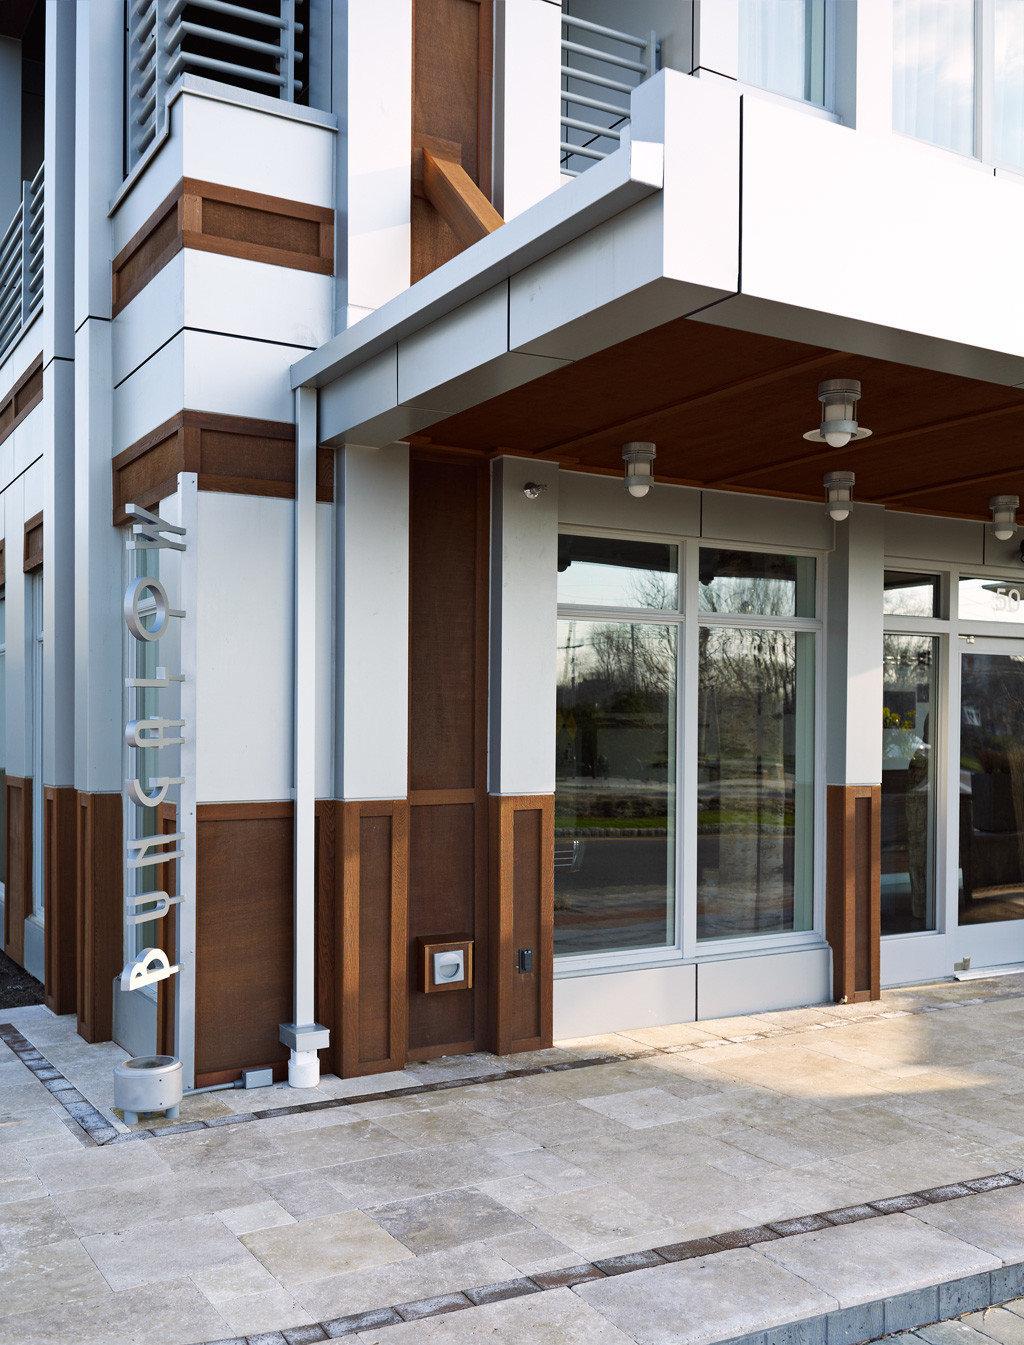 Beach Boutique Exterior Hip Party building commercial building Architecture door home porch outdoor structure